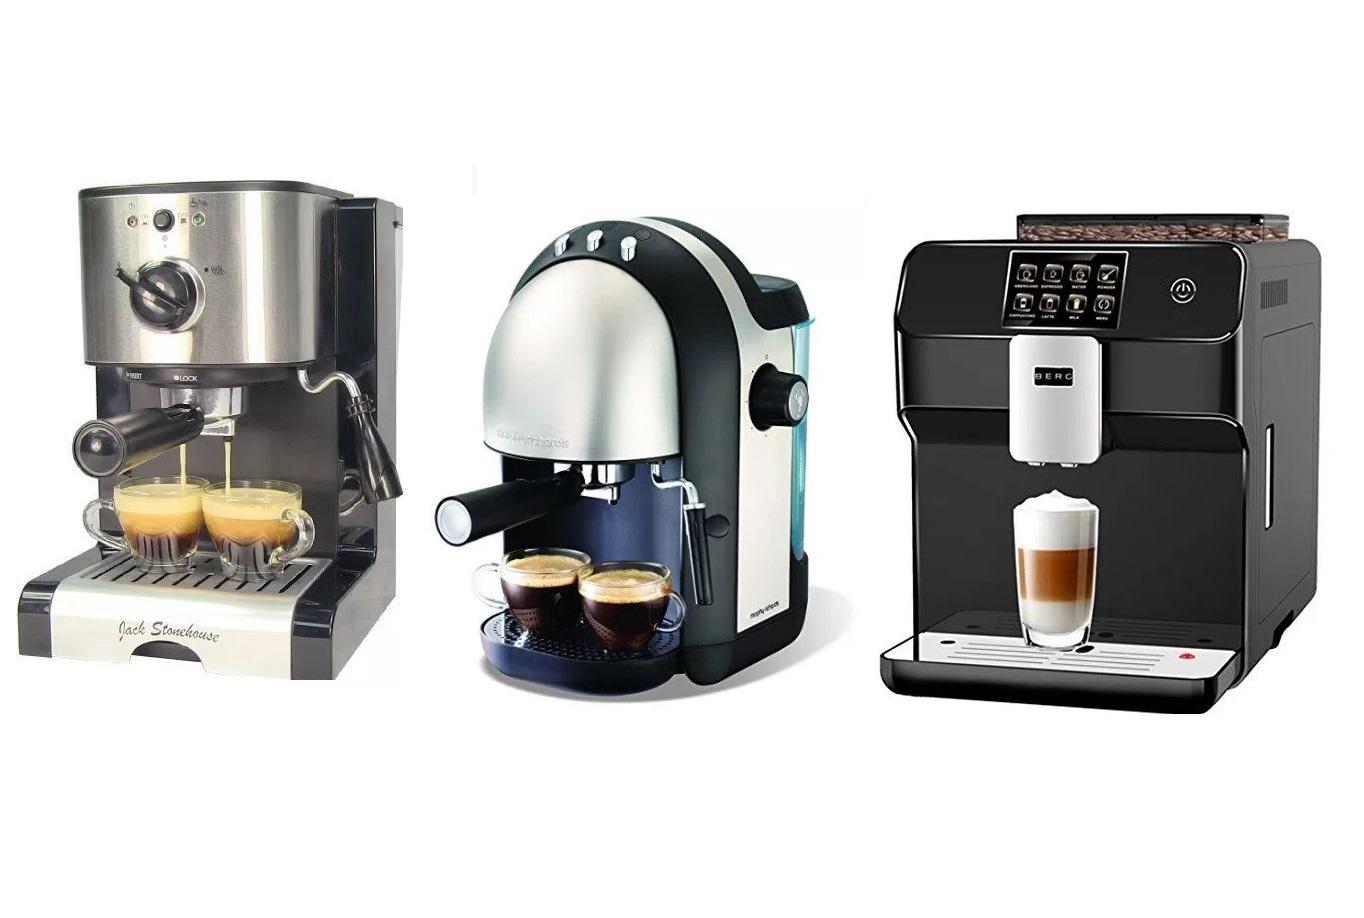 Top 10 Very Best Espresso/Cappuccino Coffee Machines You ...